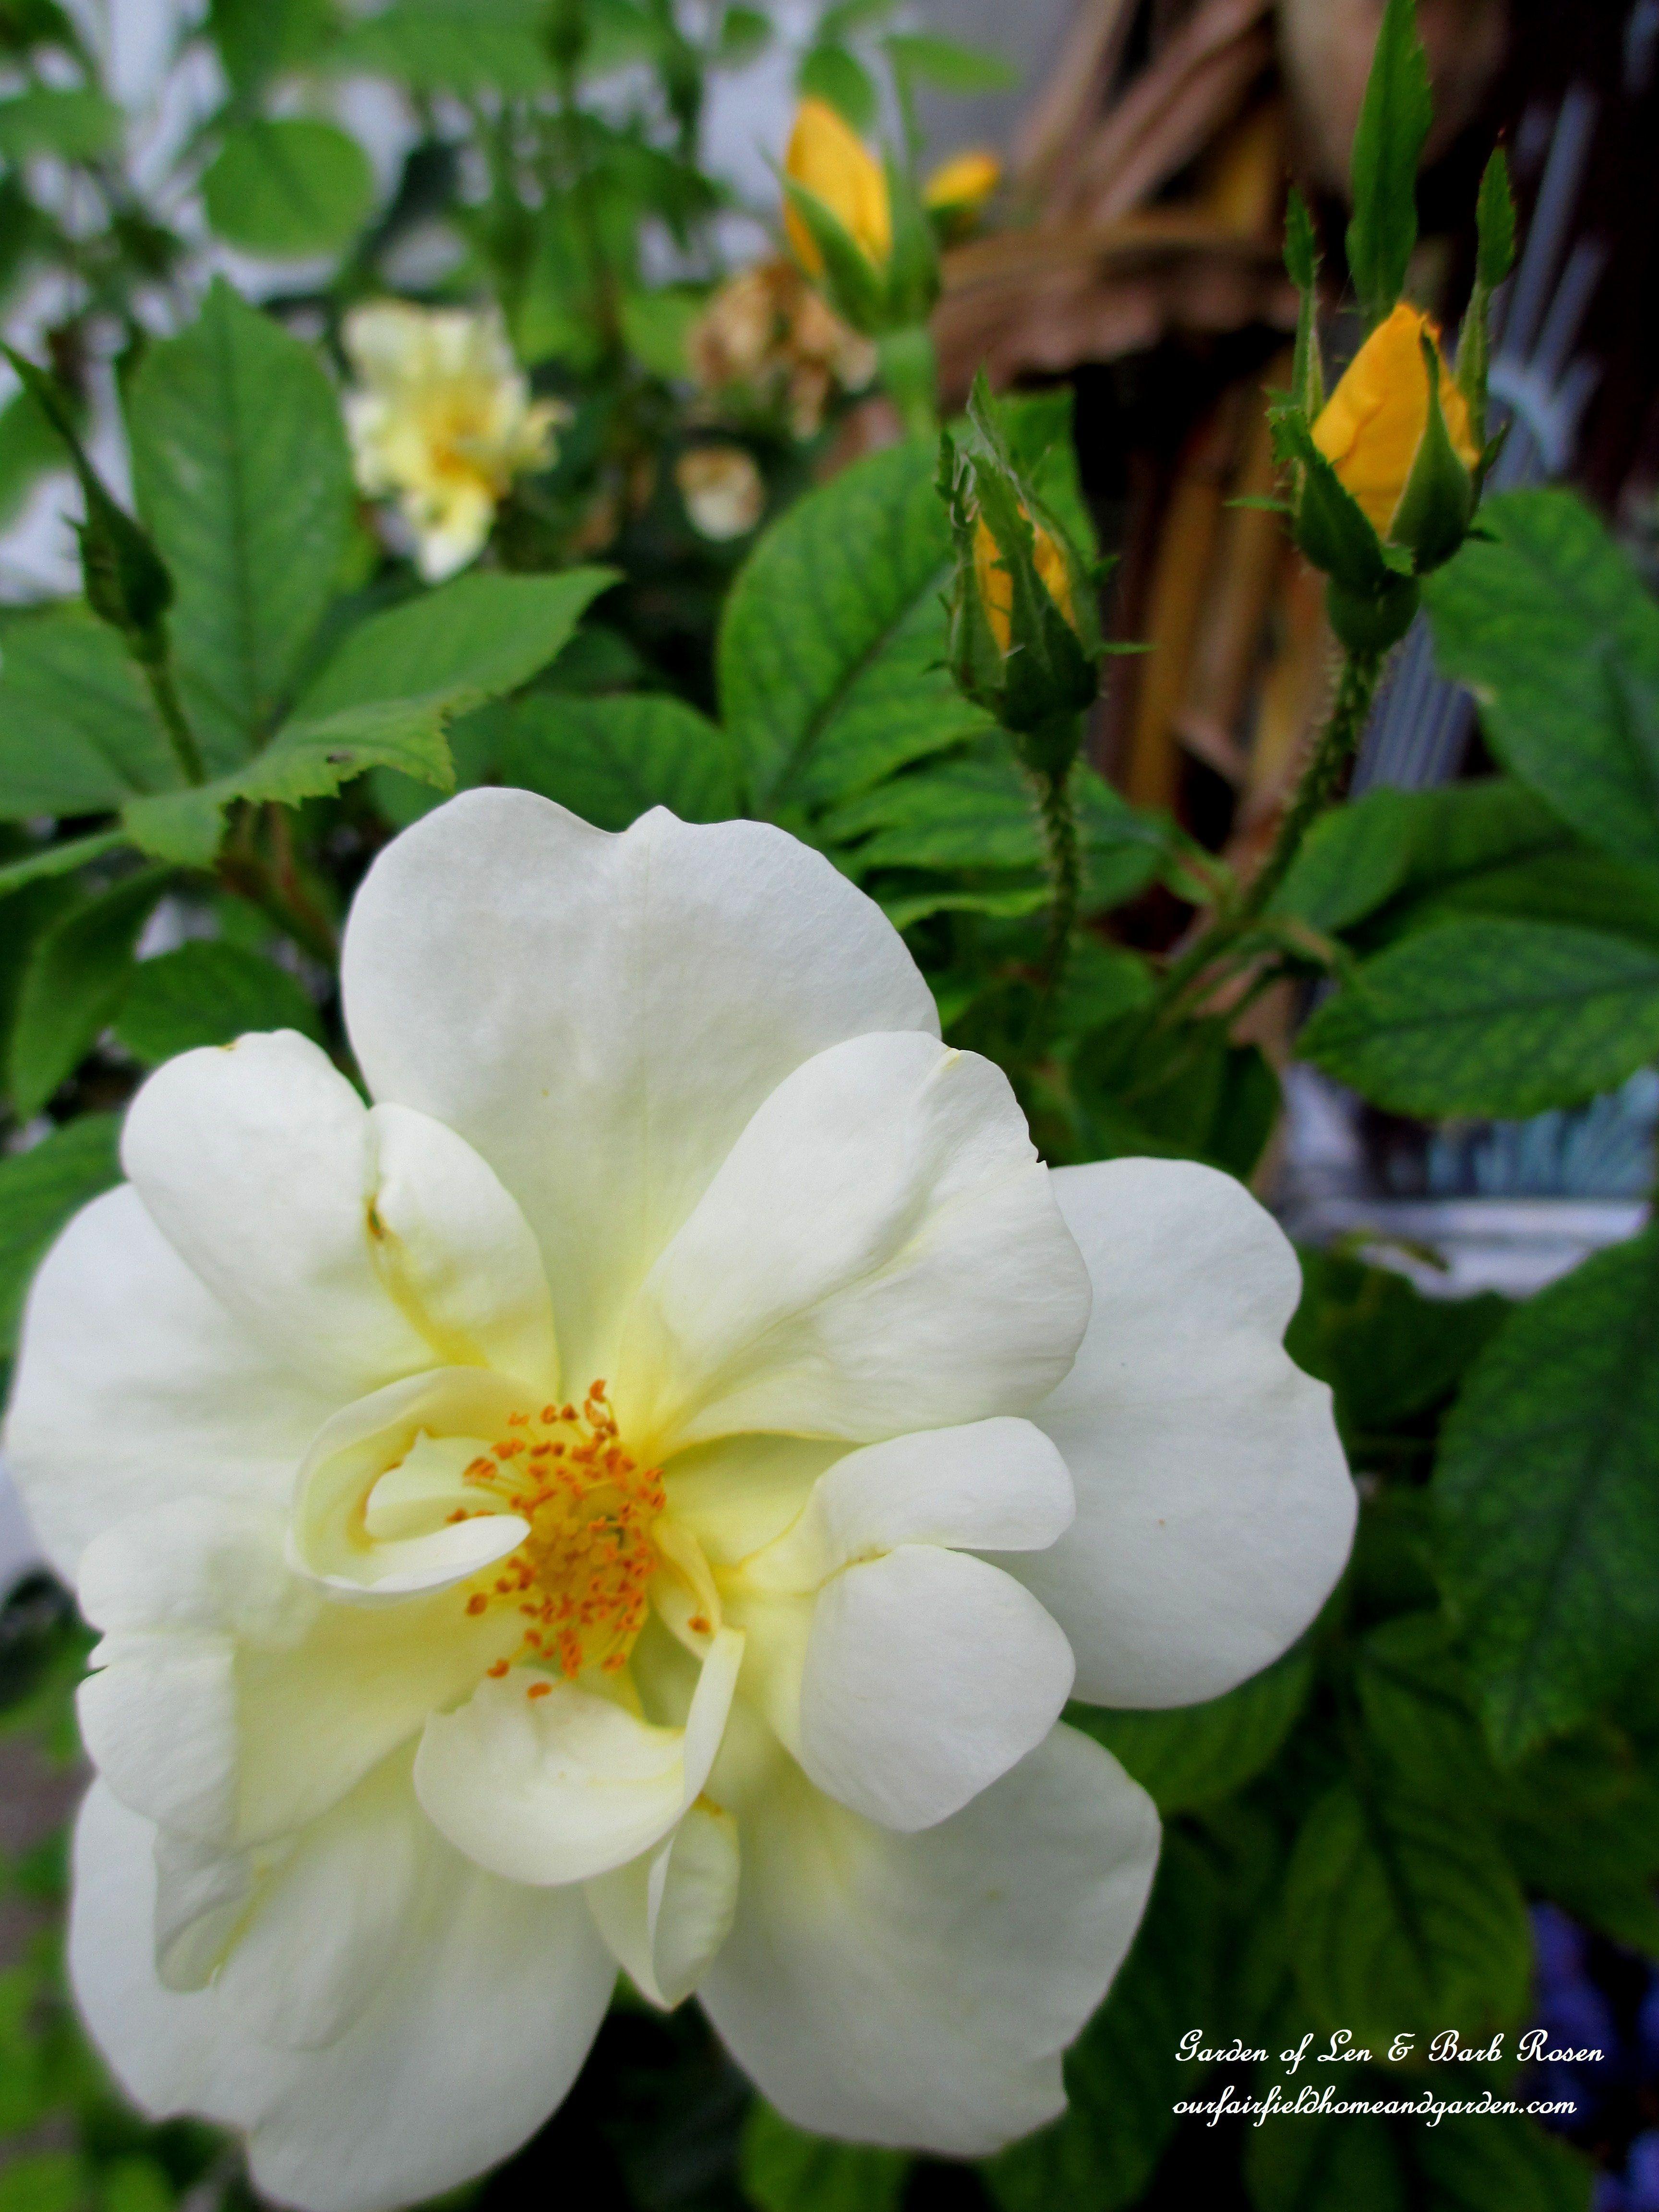 Yellow Knockout Rose (Garden of Len & Barb Rosen) #knockoutrosen Yellow Knockout Rose (Garden of Len & Barb Rosen) #knockoutrosen Yellow Knockout Rose (Garden of Len & Barb Rosen) #knockoutrosen Yellow Knockout Rose (Garden of Len & Barb Rosen) #knockoutrosen